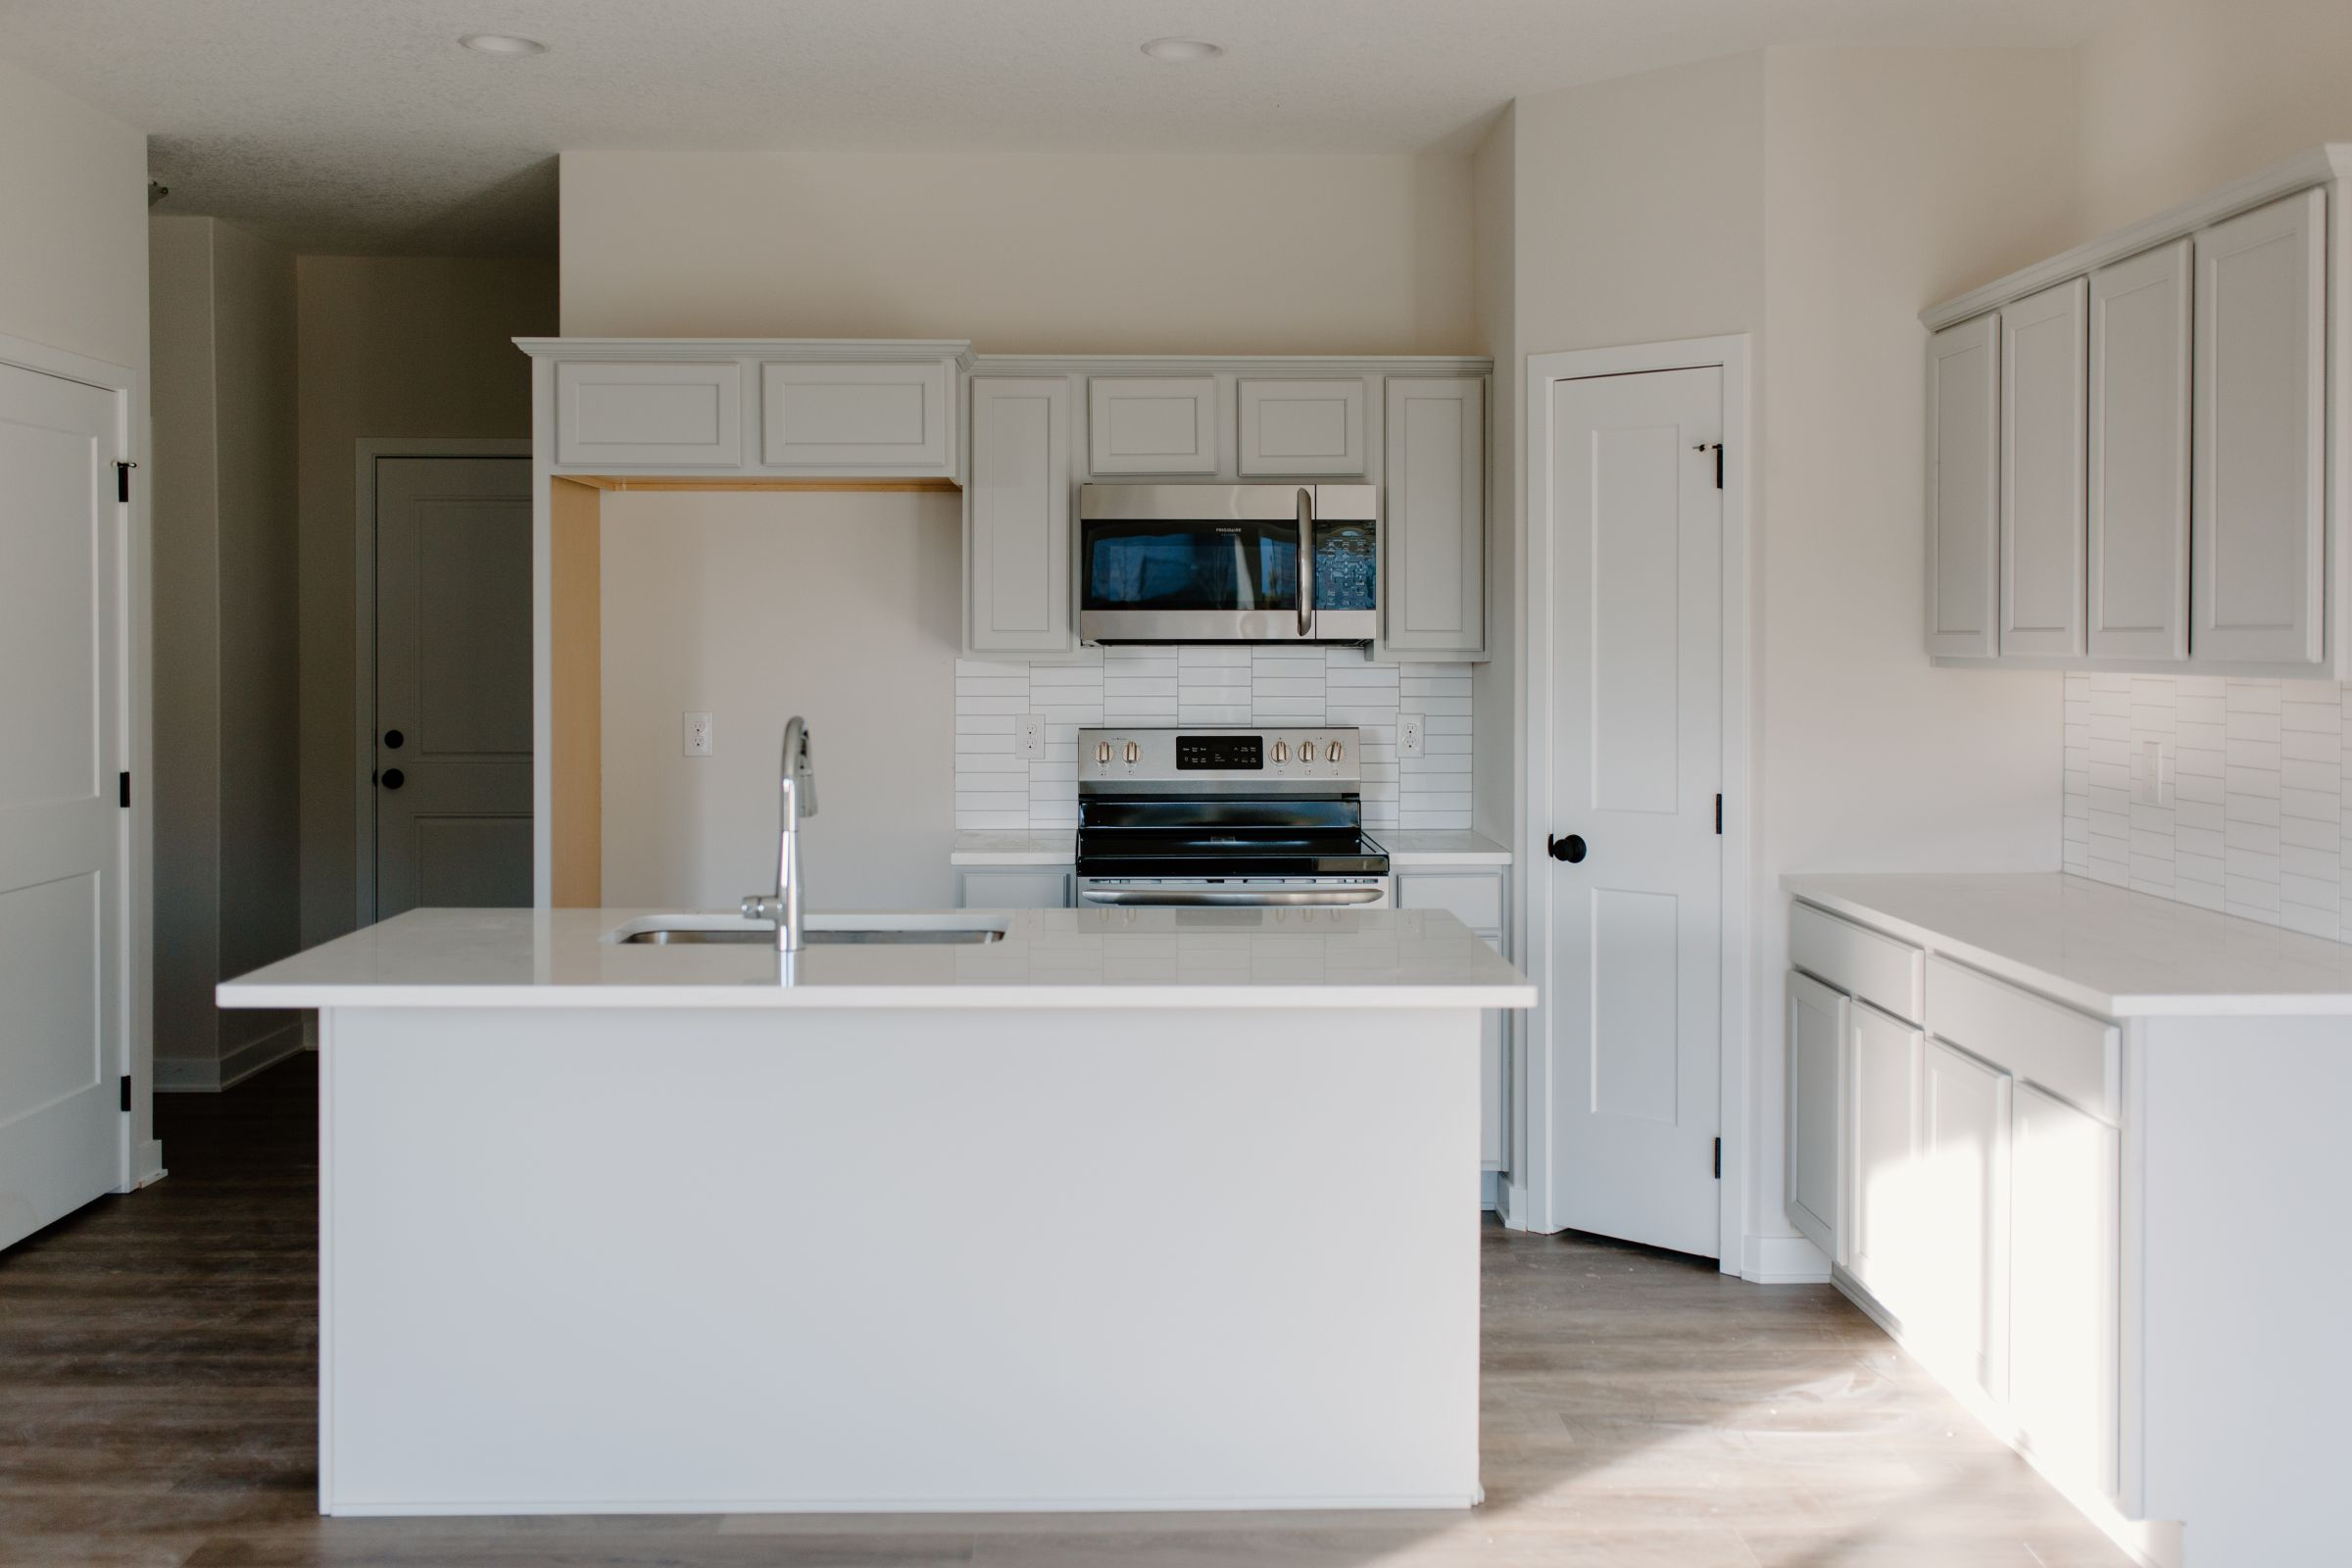 residential-warren-county-iowa-0-acres-listing-number-15365-3-2021-02-17-220735.jpg